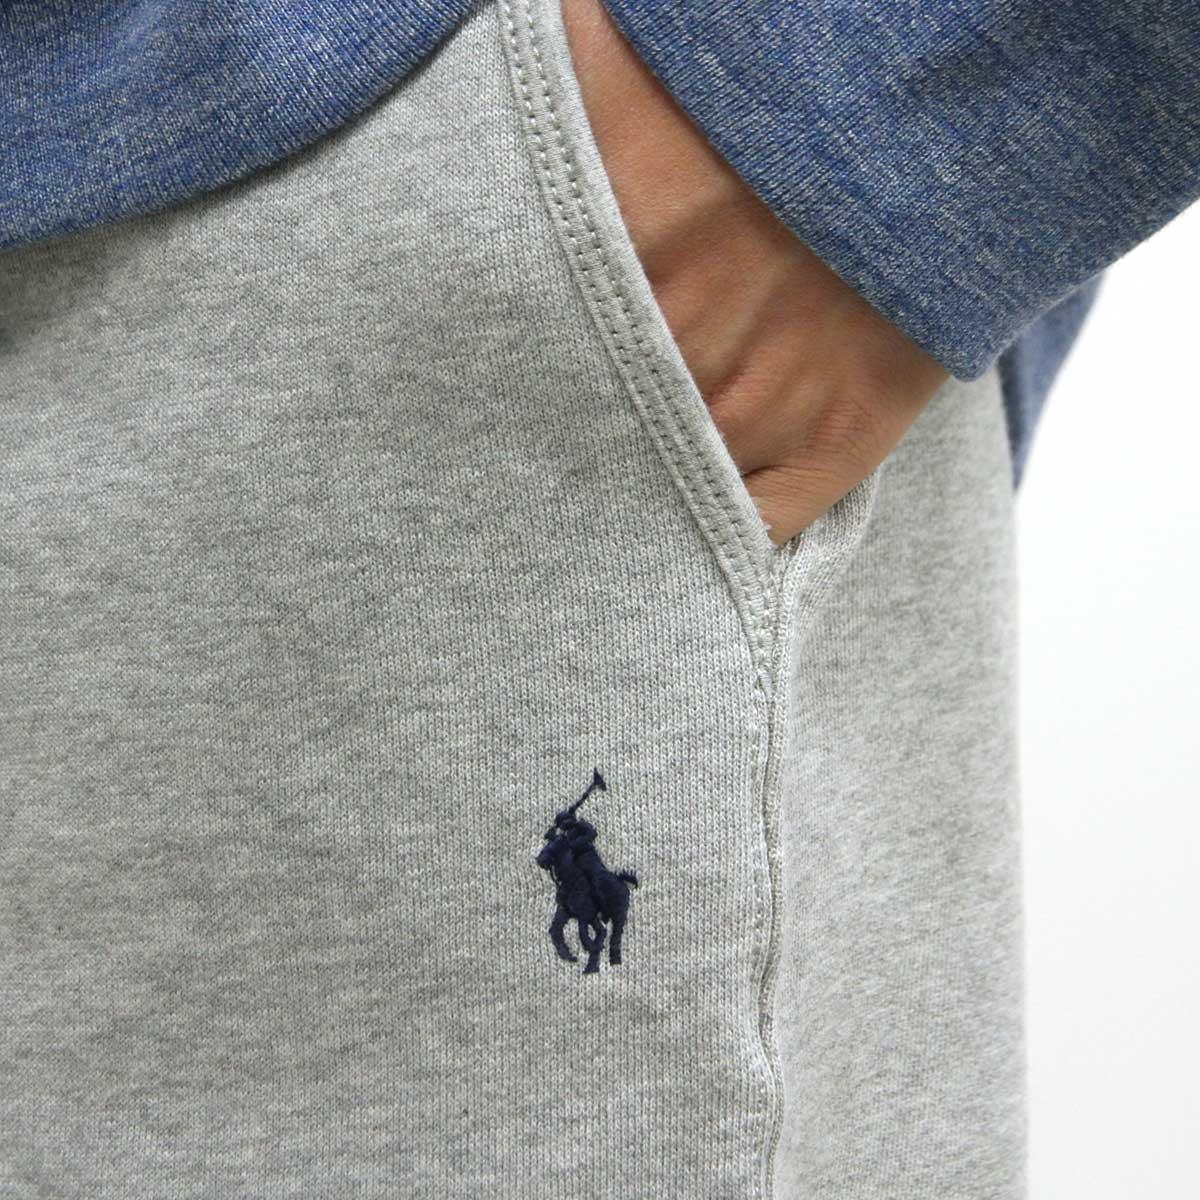 7b751023 Polo Ralph Lauren sweat shirt men's regular article POLO RALPH LAUREN  trainer underwear Classic Fleece Athletic Pant D15S25